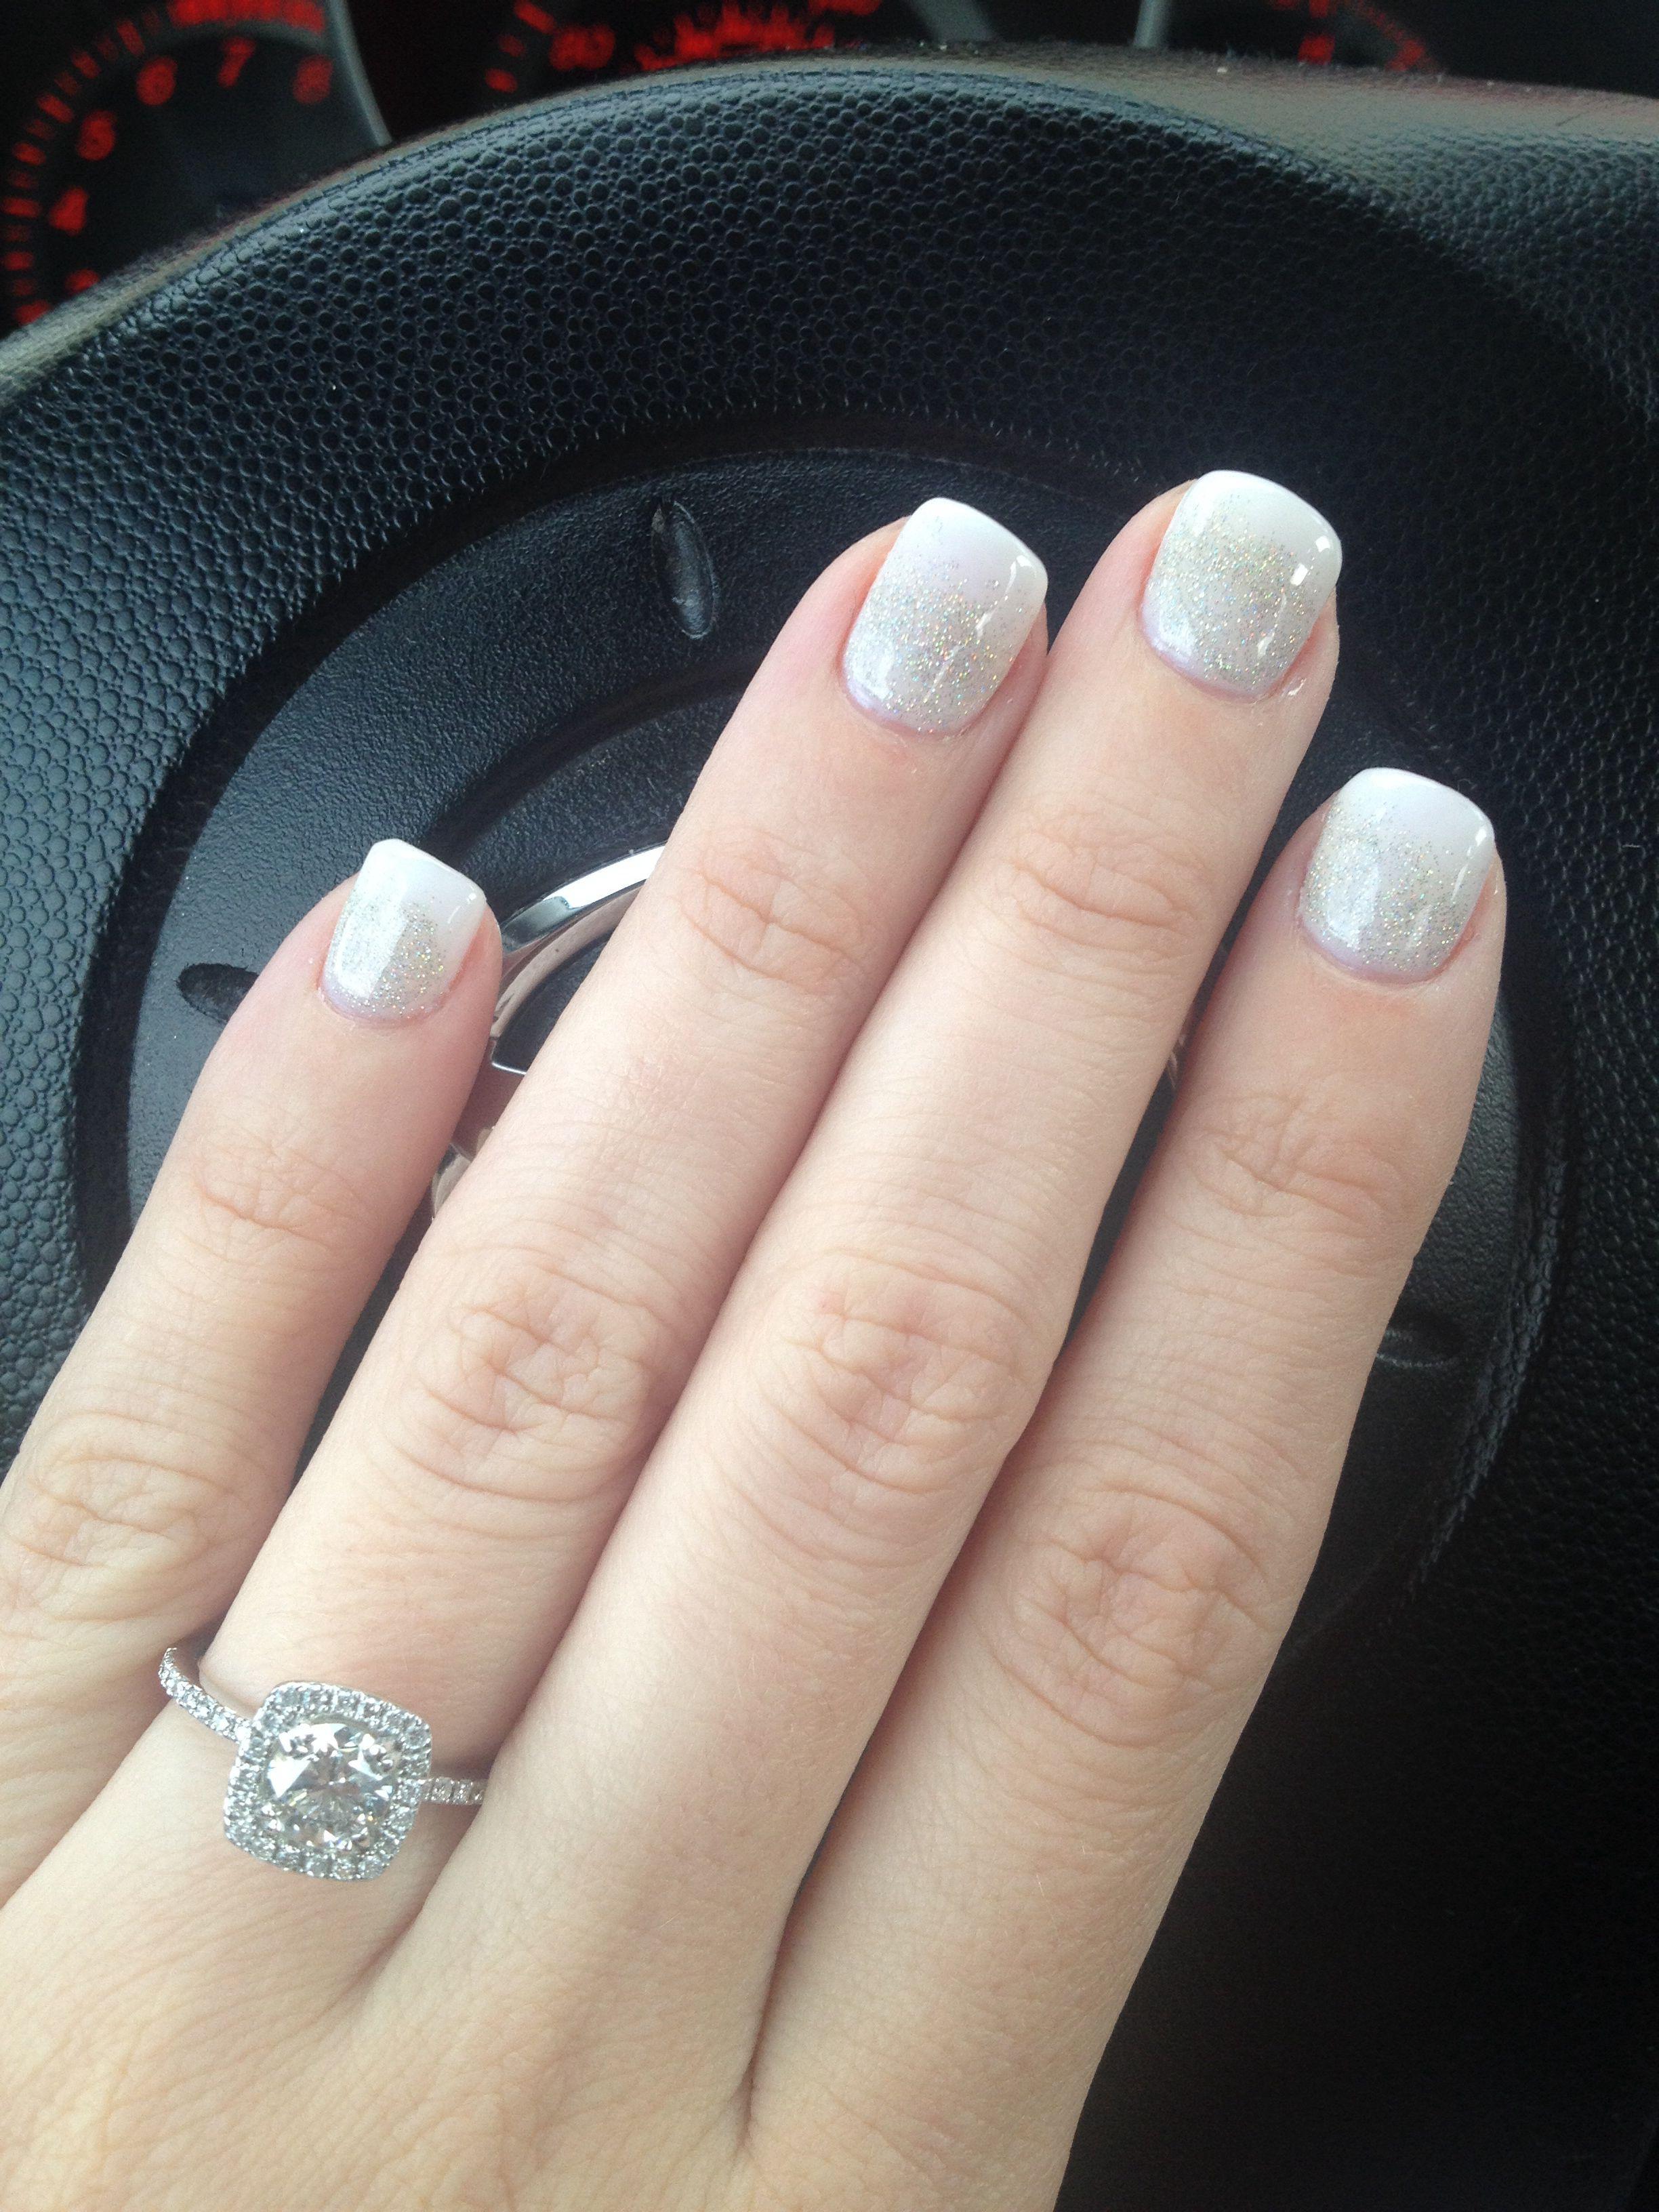 Glitter gel nails. Funny bunny. | Nails | Pinterest | Glitter gel ...